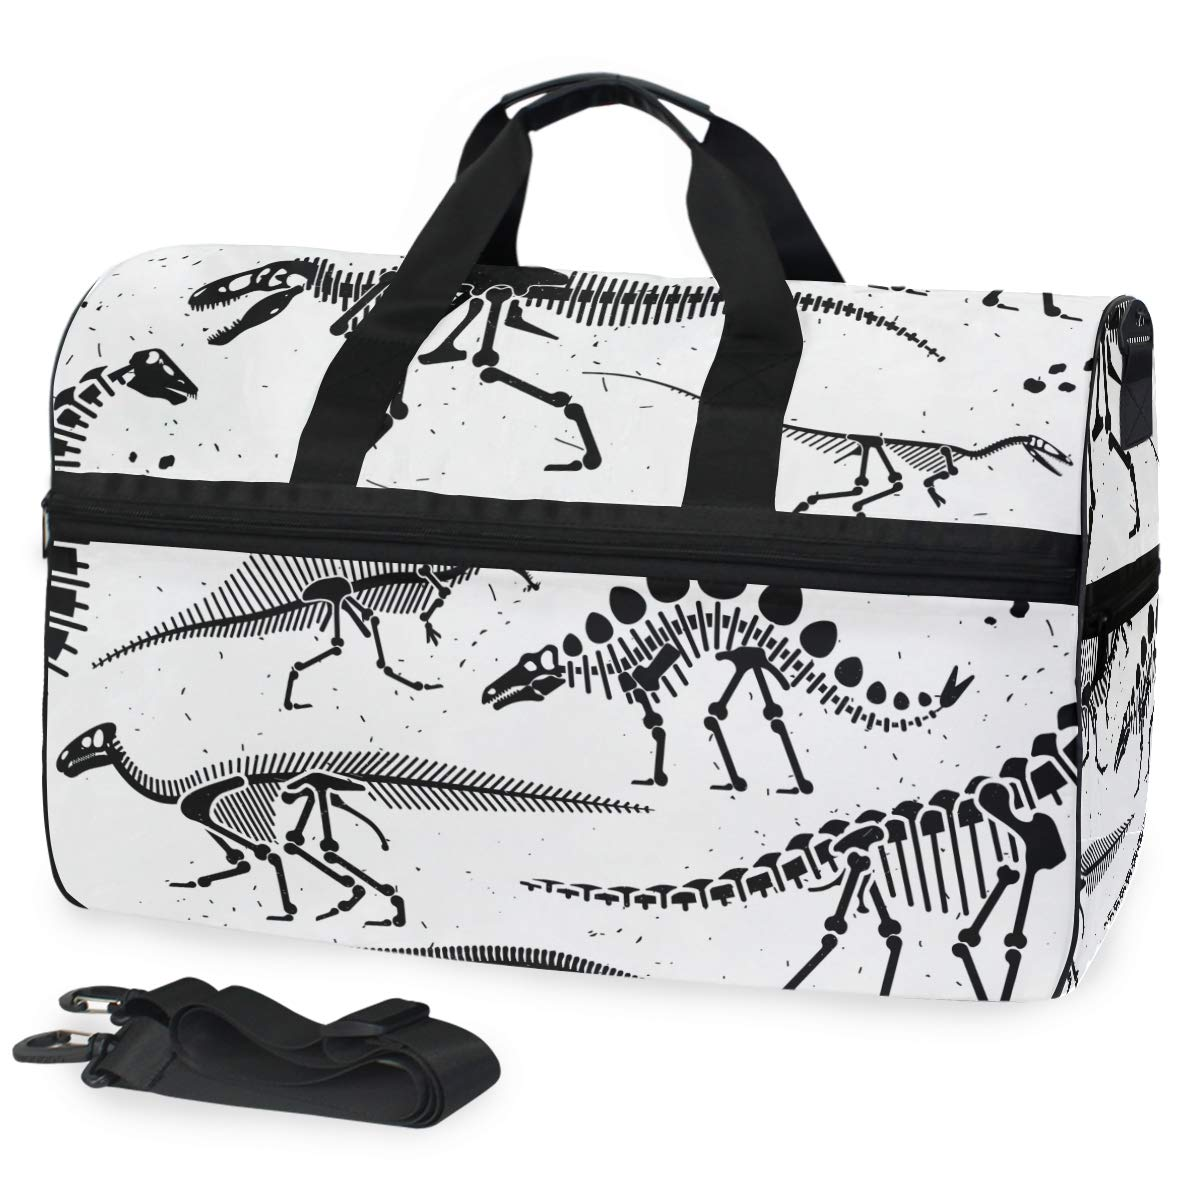 df0437fc2440 Amazon.com | AHOMY Dinosaur Skeleton White Black Sports Gym Bag with Shoes  Compartment Travel Duffel Bag | Sports Duffels